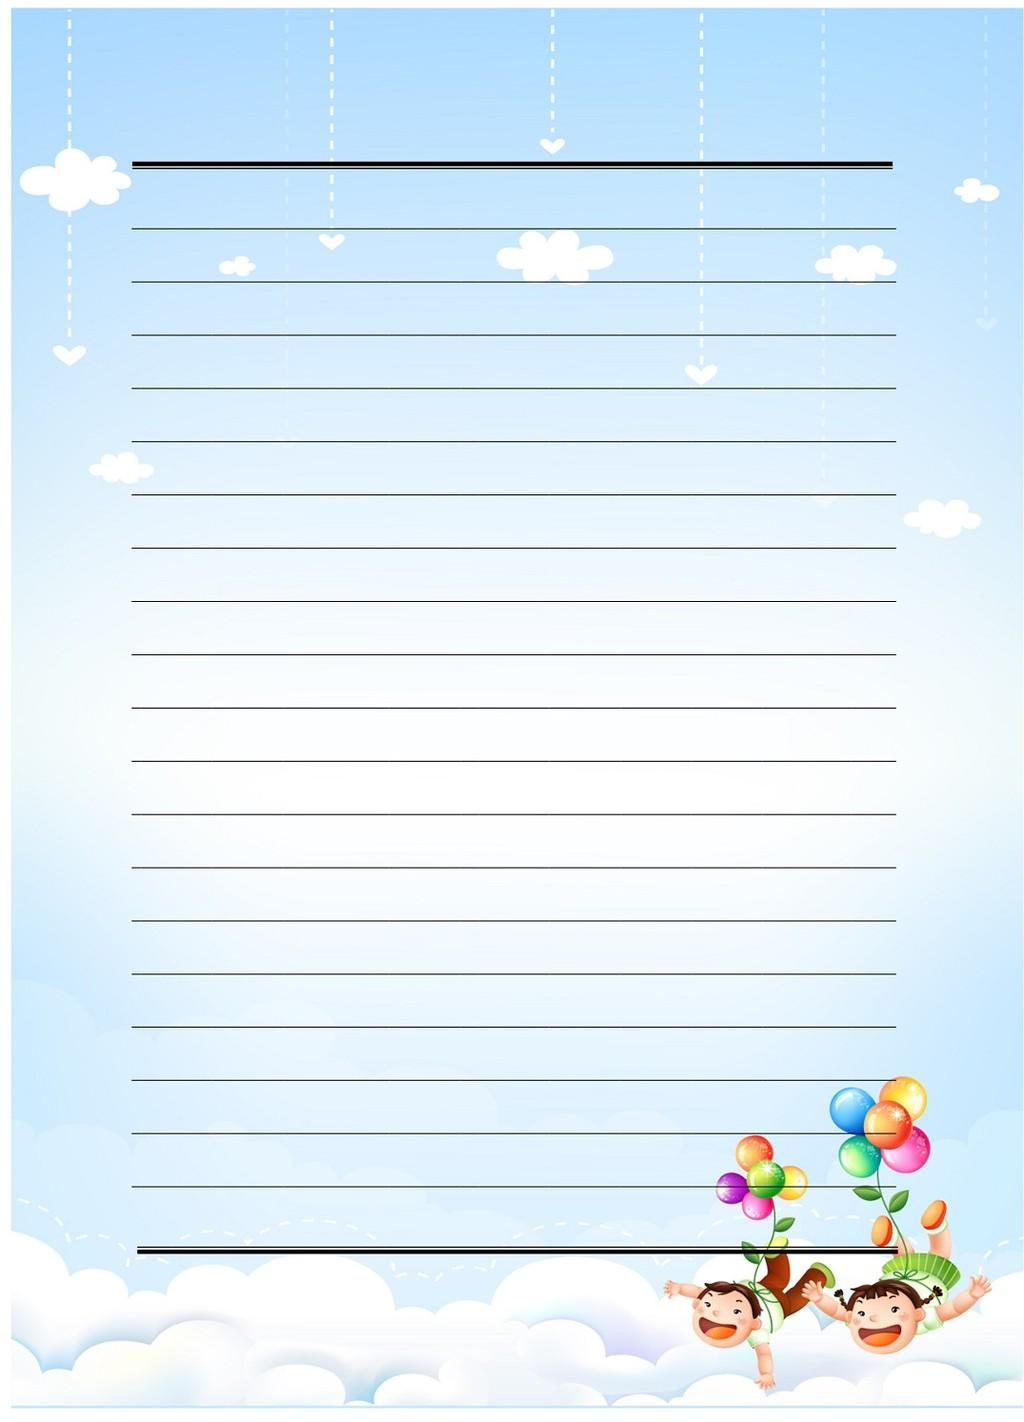 word模板 word素材 信纸